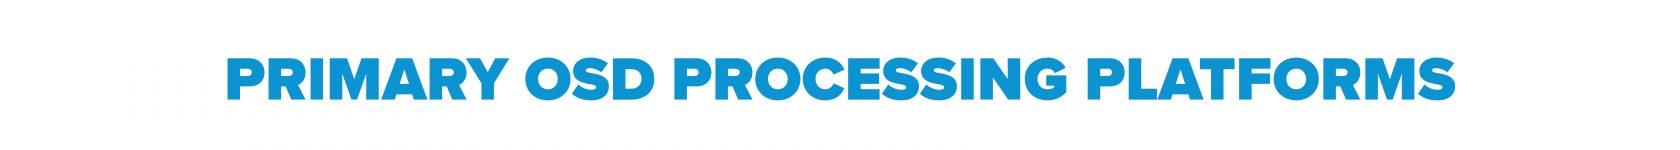 _1 Primary OSD Processing Platforms Header